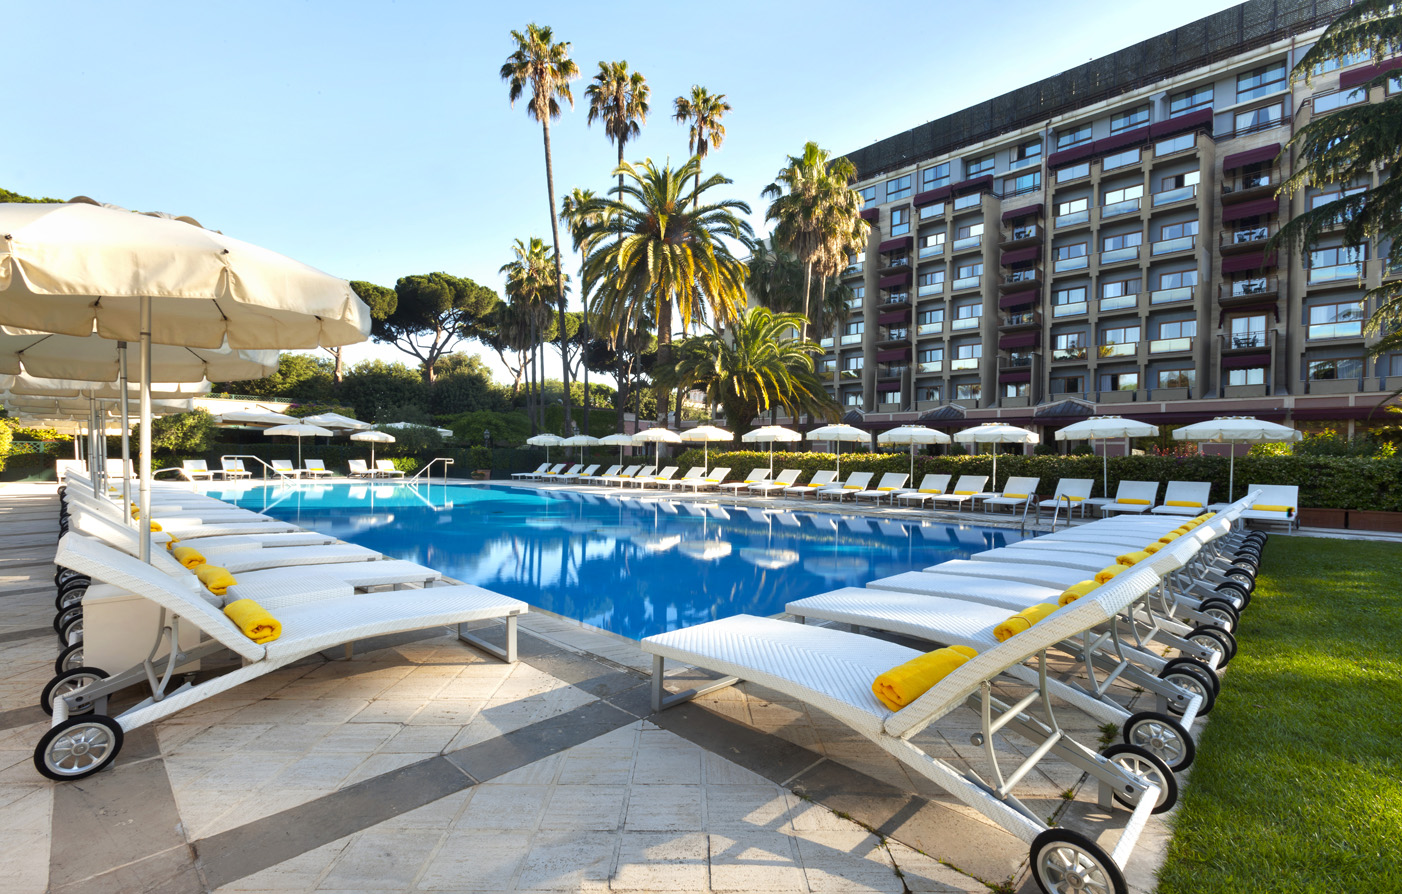 hotel activities in rome italy parco dei principi grand hotel spa. Black Bedroom Furniture Sets. Home Design Ideas